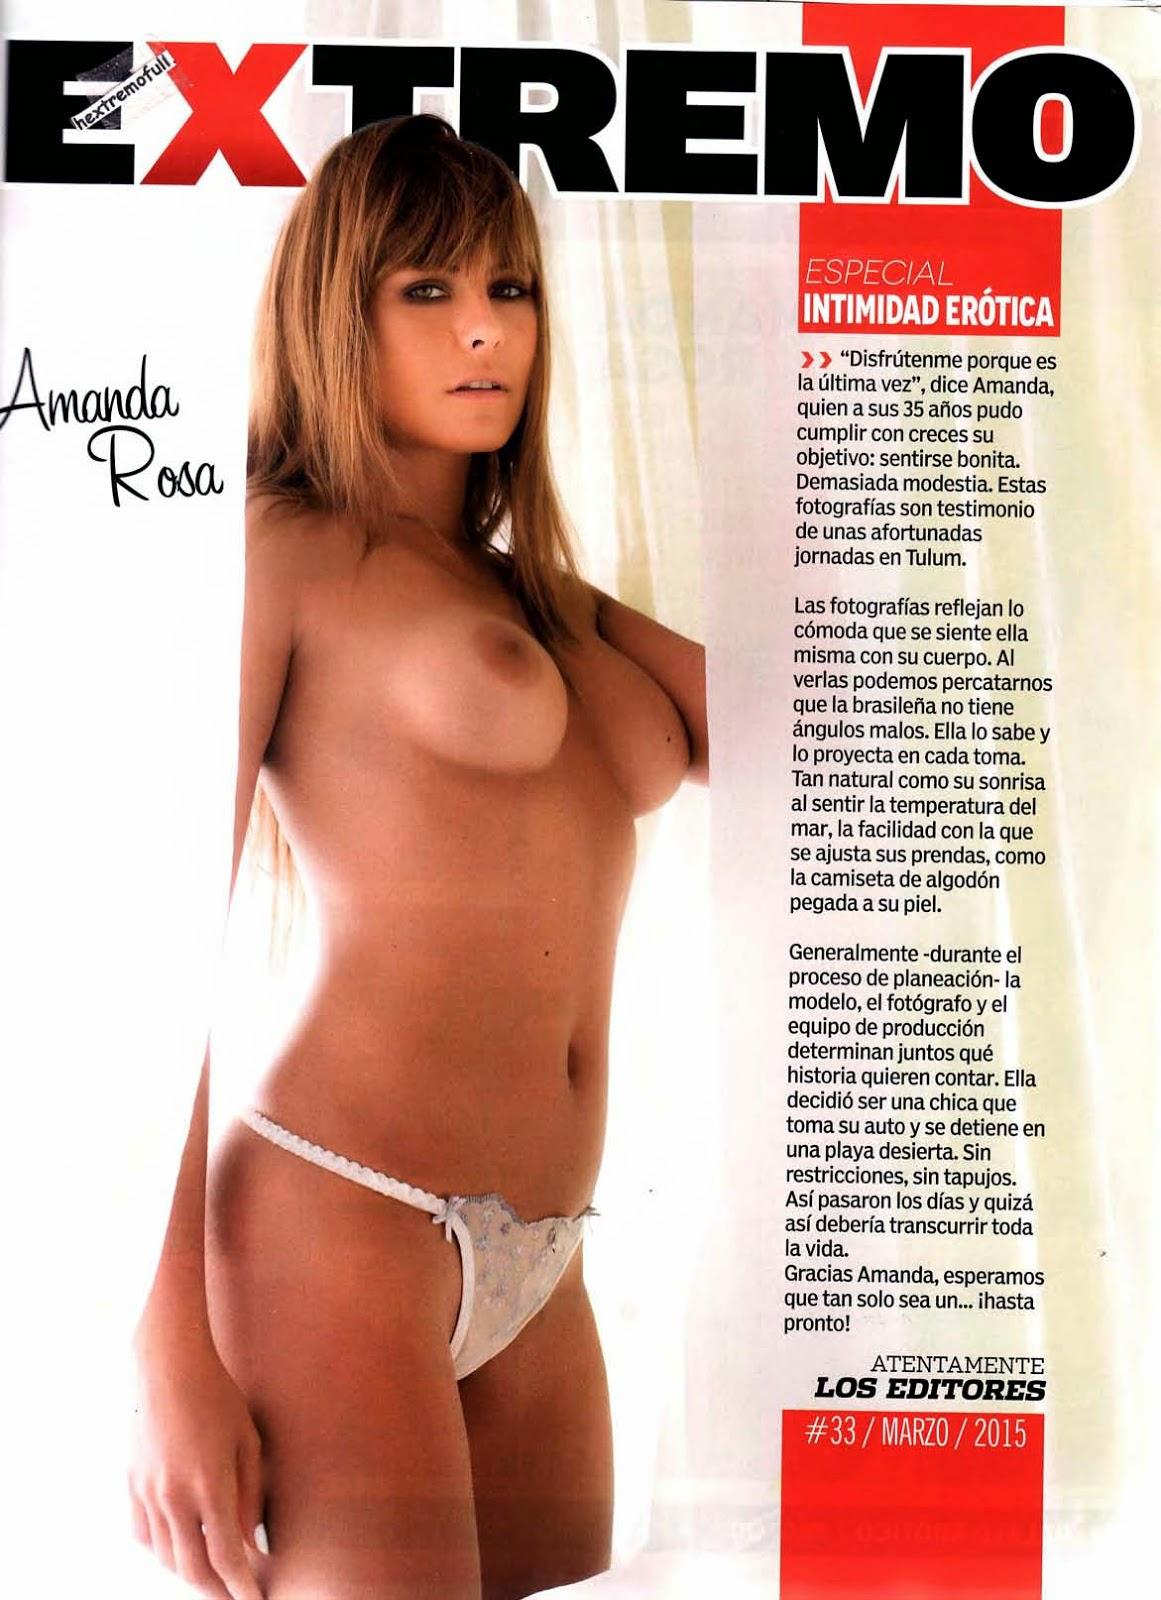 Amanda Rosa H Extremo amanda rosa pussy - sexy lingerie vids